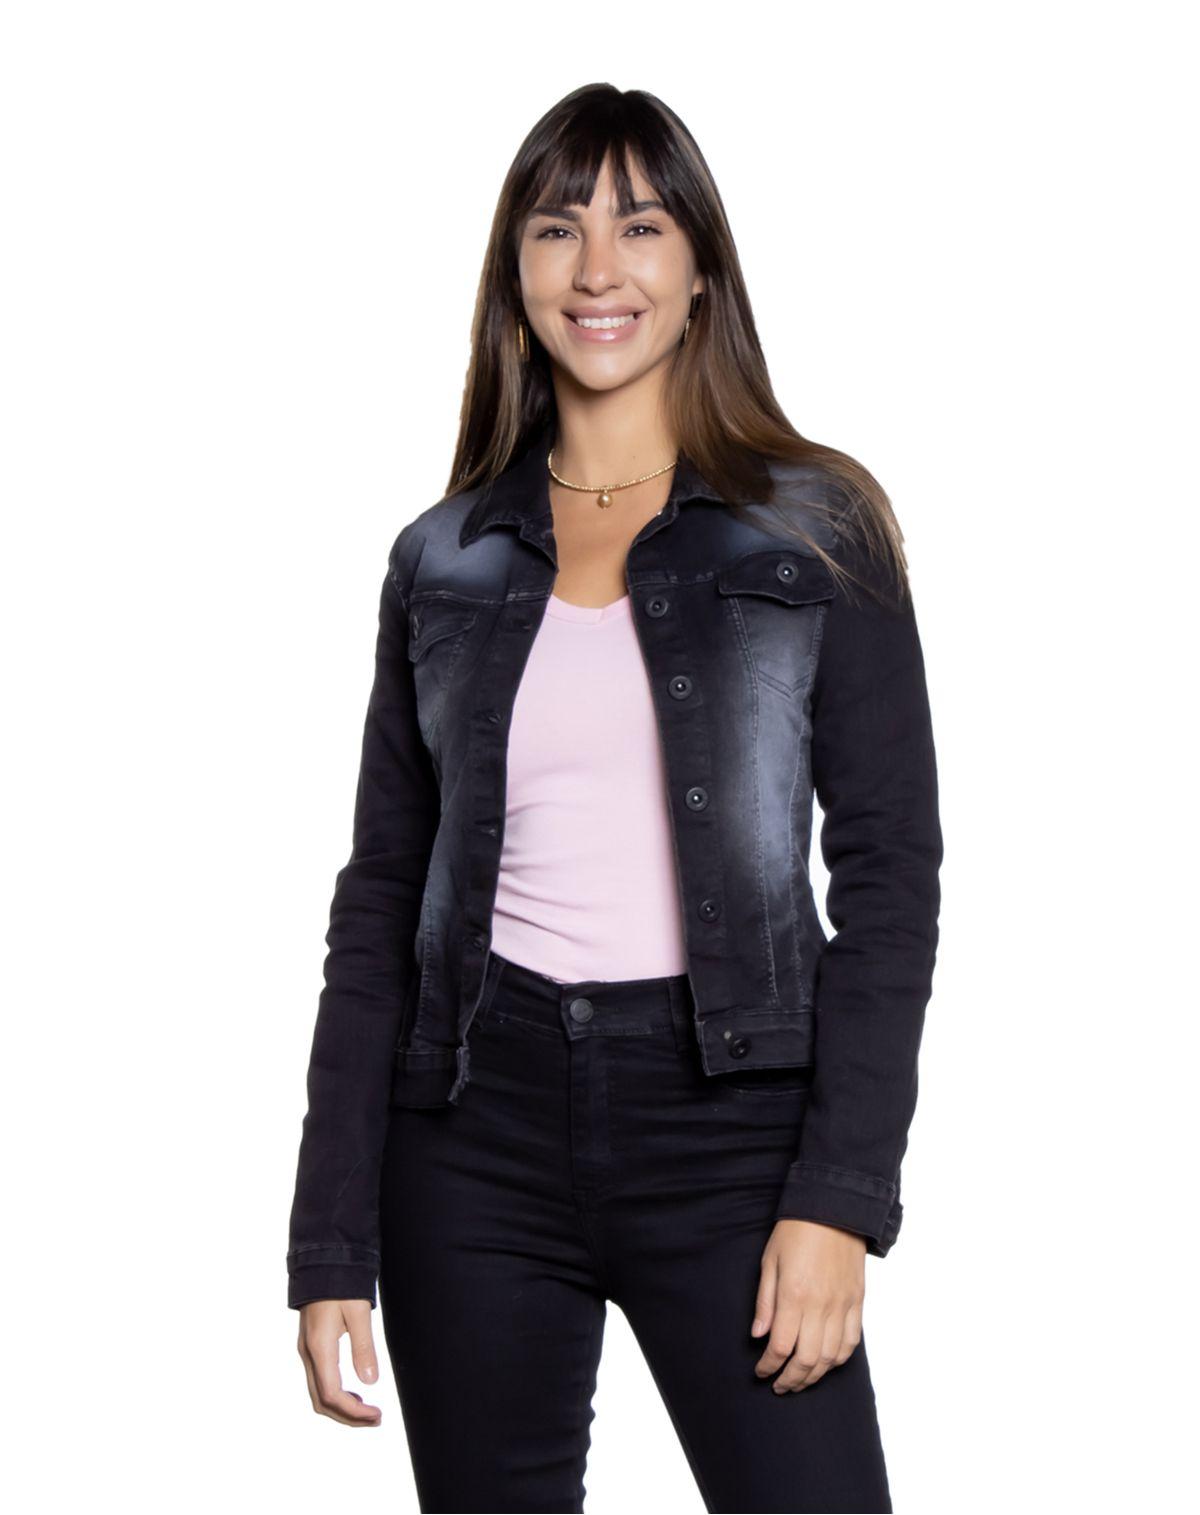 592602001-jaqueta-jeans-black-feminina-estonada-jeans-escuro-p-24d